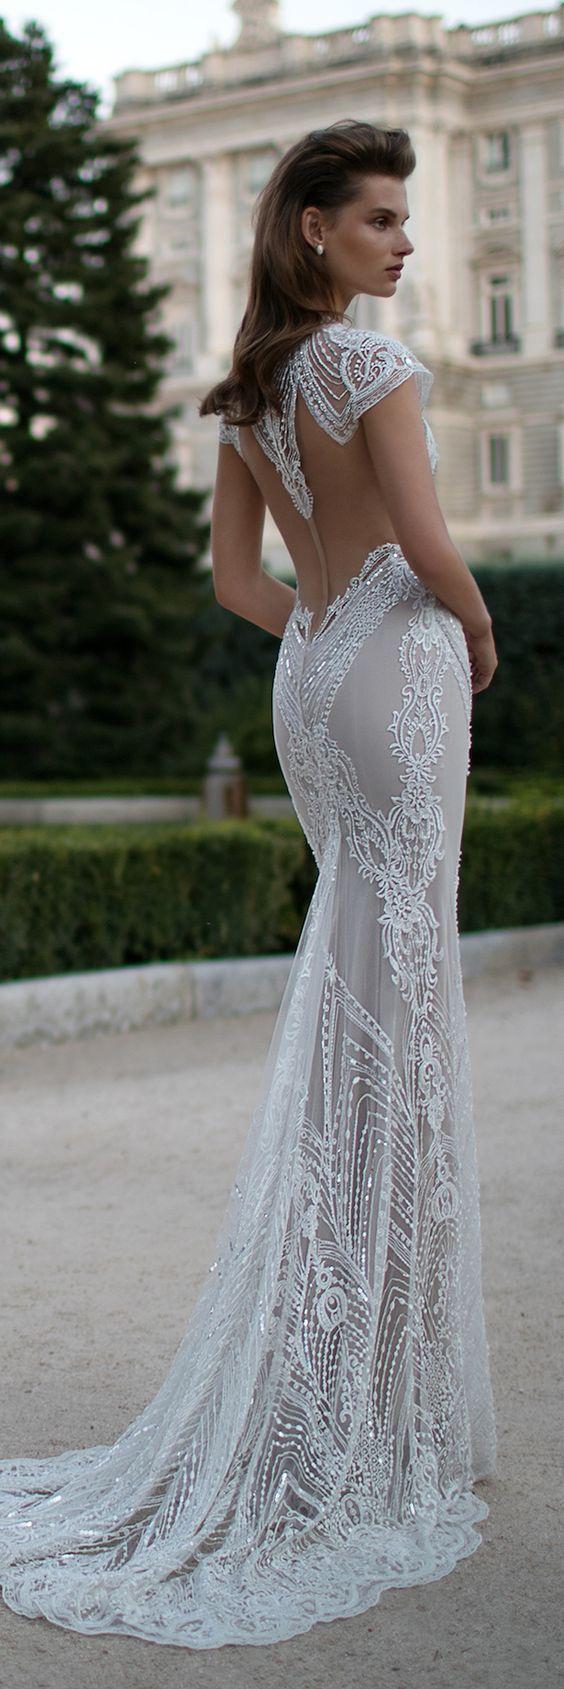 wedding dress gallery vintage lace wedding dress Vintage Lace Wedding Dress by Berta Spring